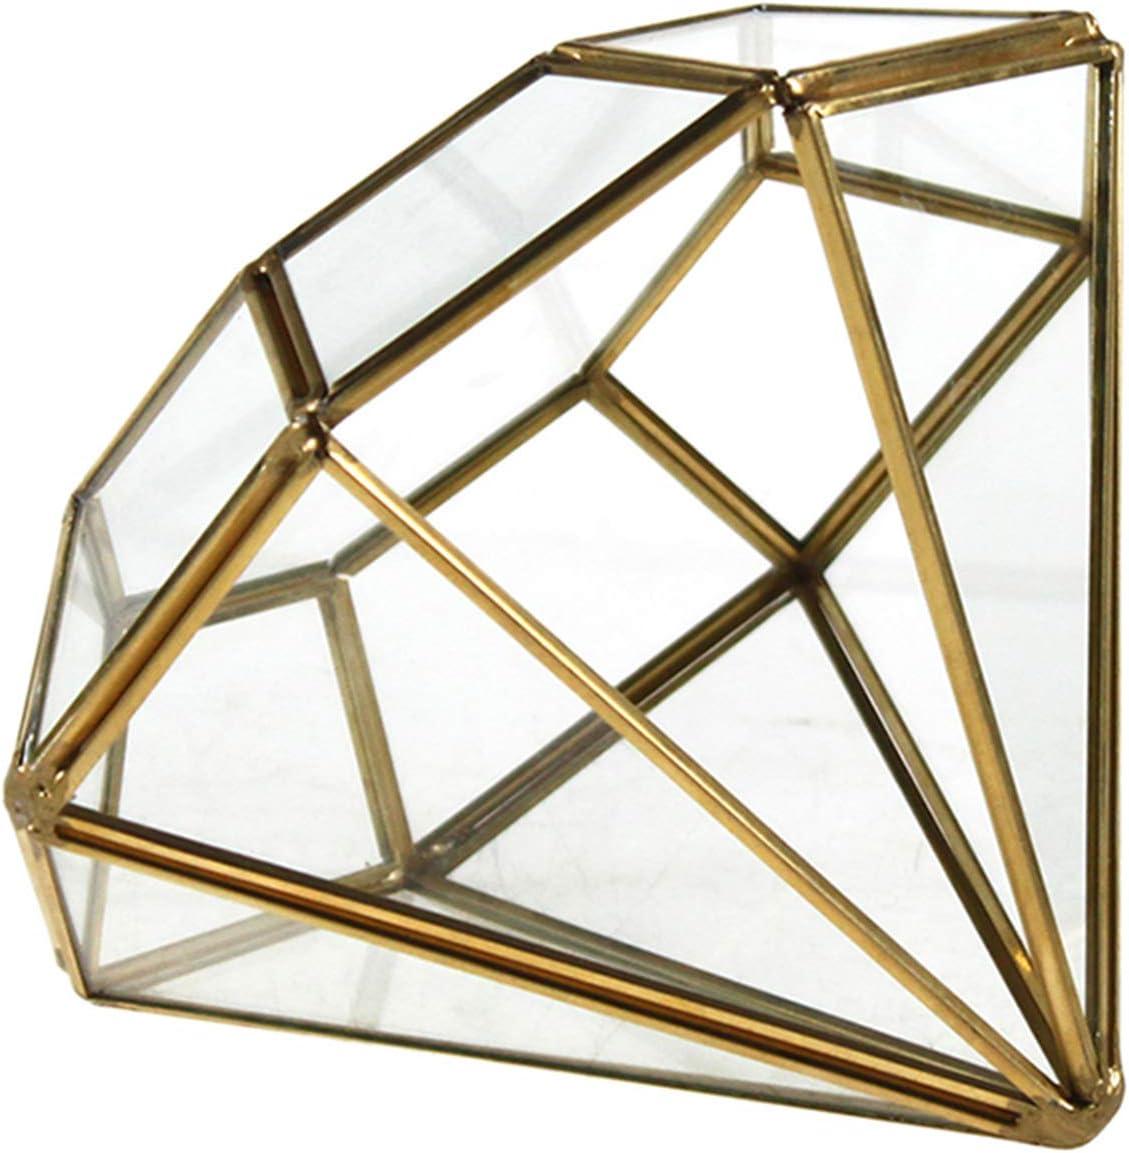 "WGV Geometric Planter Terrarium, Width 5.3"" Height 6"" Clear Glass Gold Frame DIY Succulent air Plant Miniature Fairy Garden Windowsill Tabletop Decor, Diamond 1 Piece"